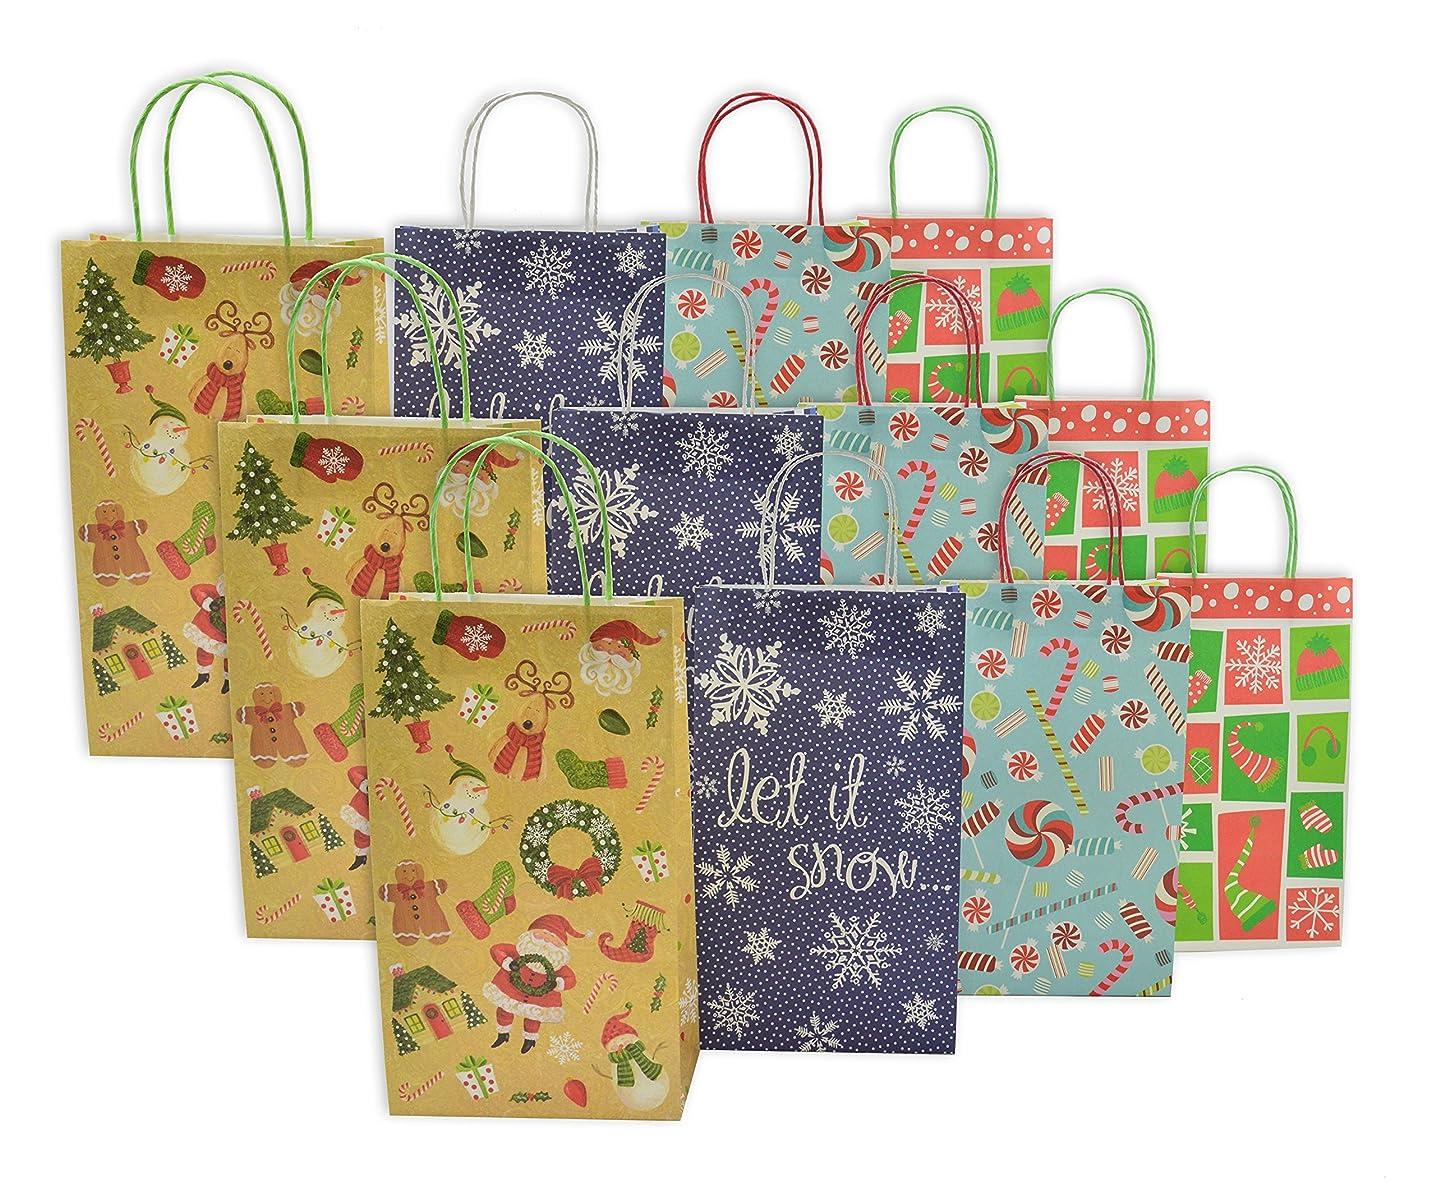 Christmas Medium Gift Bags Christmas Designs Goodie Bags White Kraft, 12 Pack